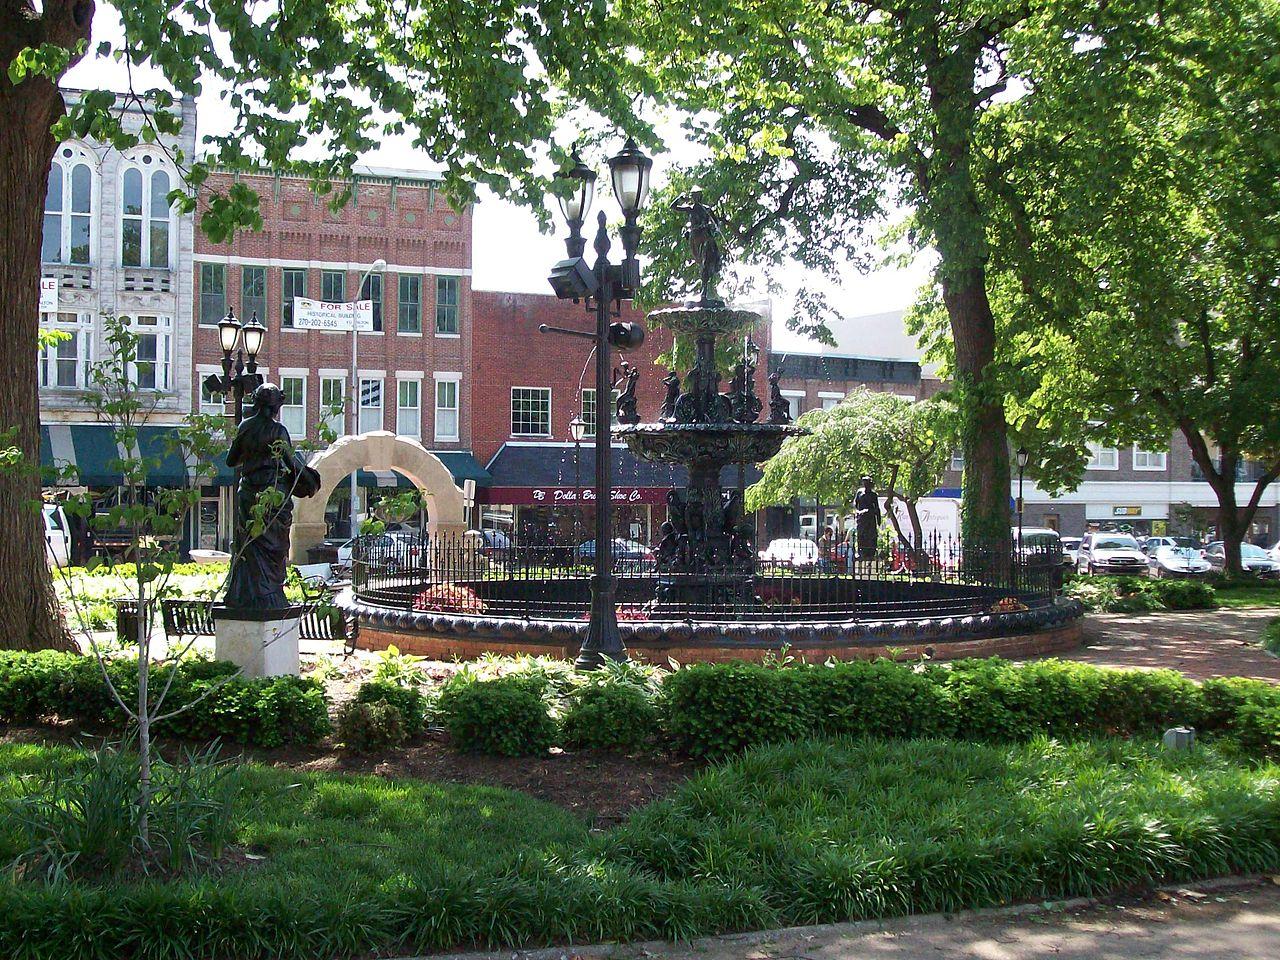 Fountain_Square_Park,_Bowling_Green,_Kentucky